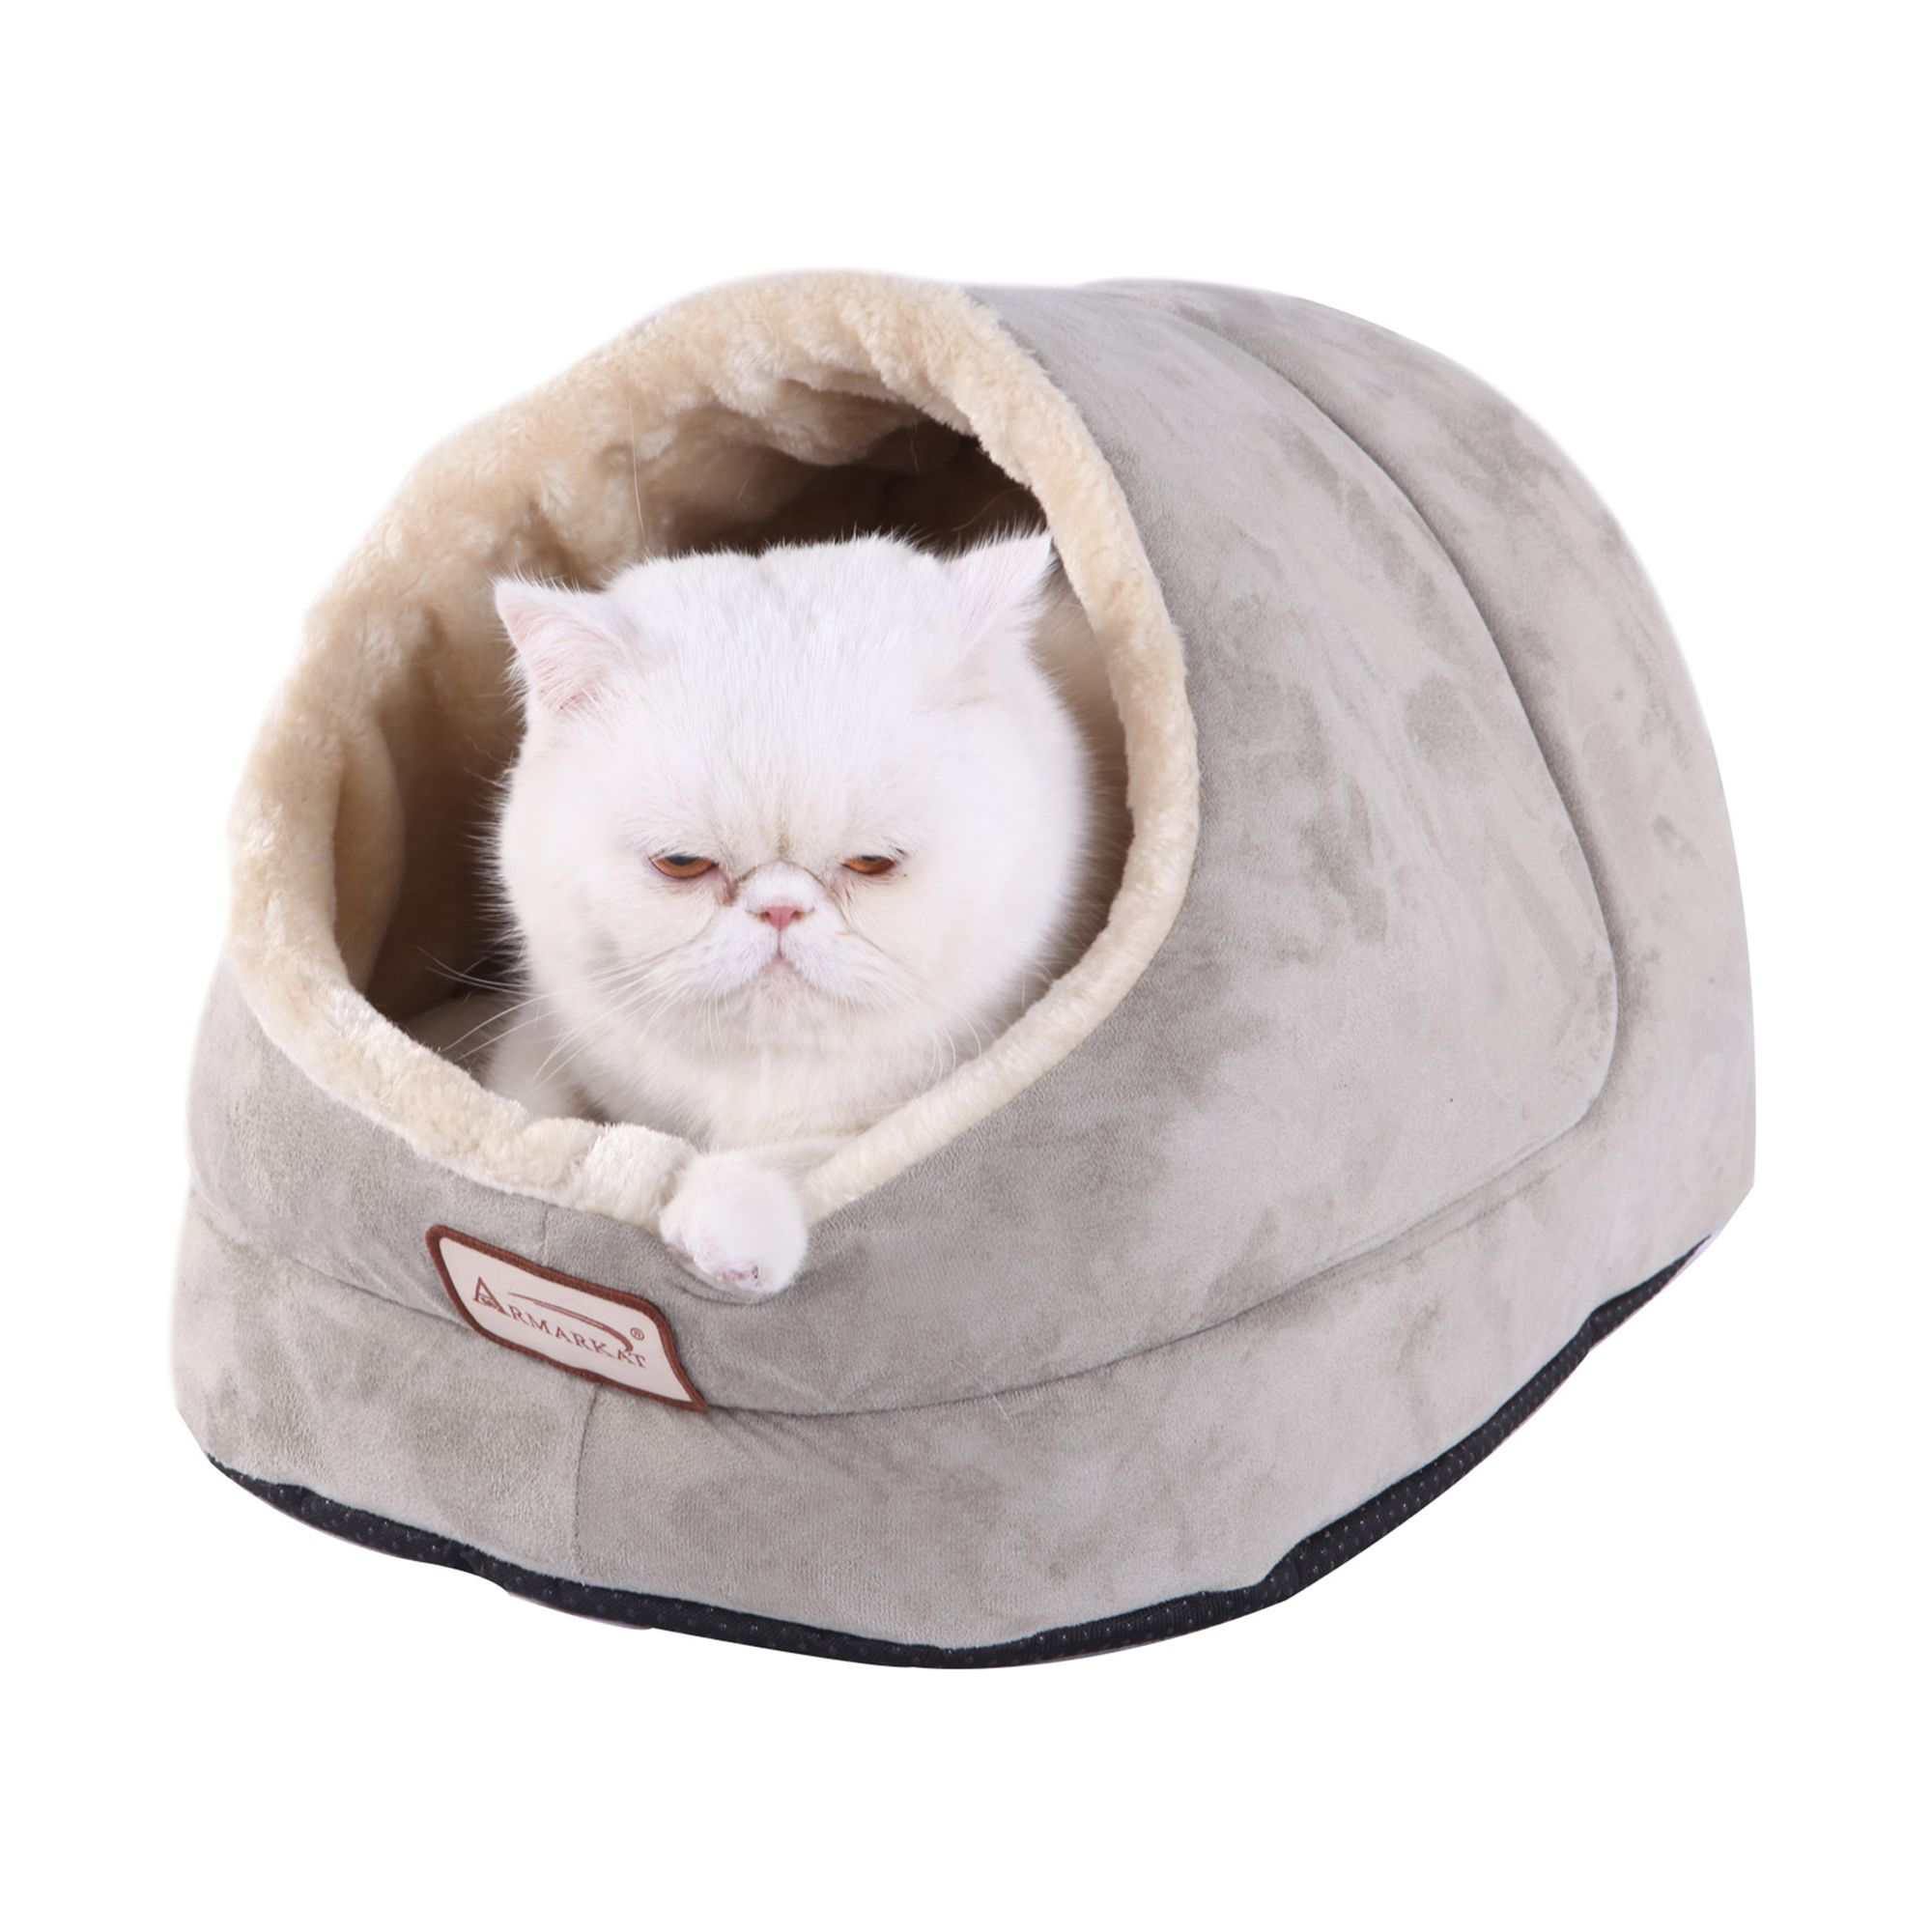 "Armarkat Enclosed Pet Bed size: 18""L x 14""W x 12""H, Sage Green & Beige"